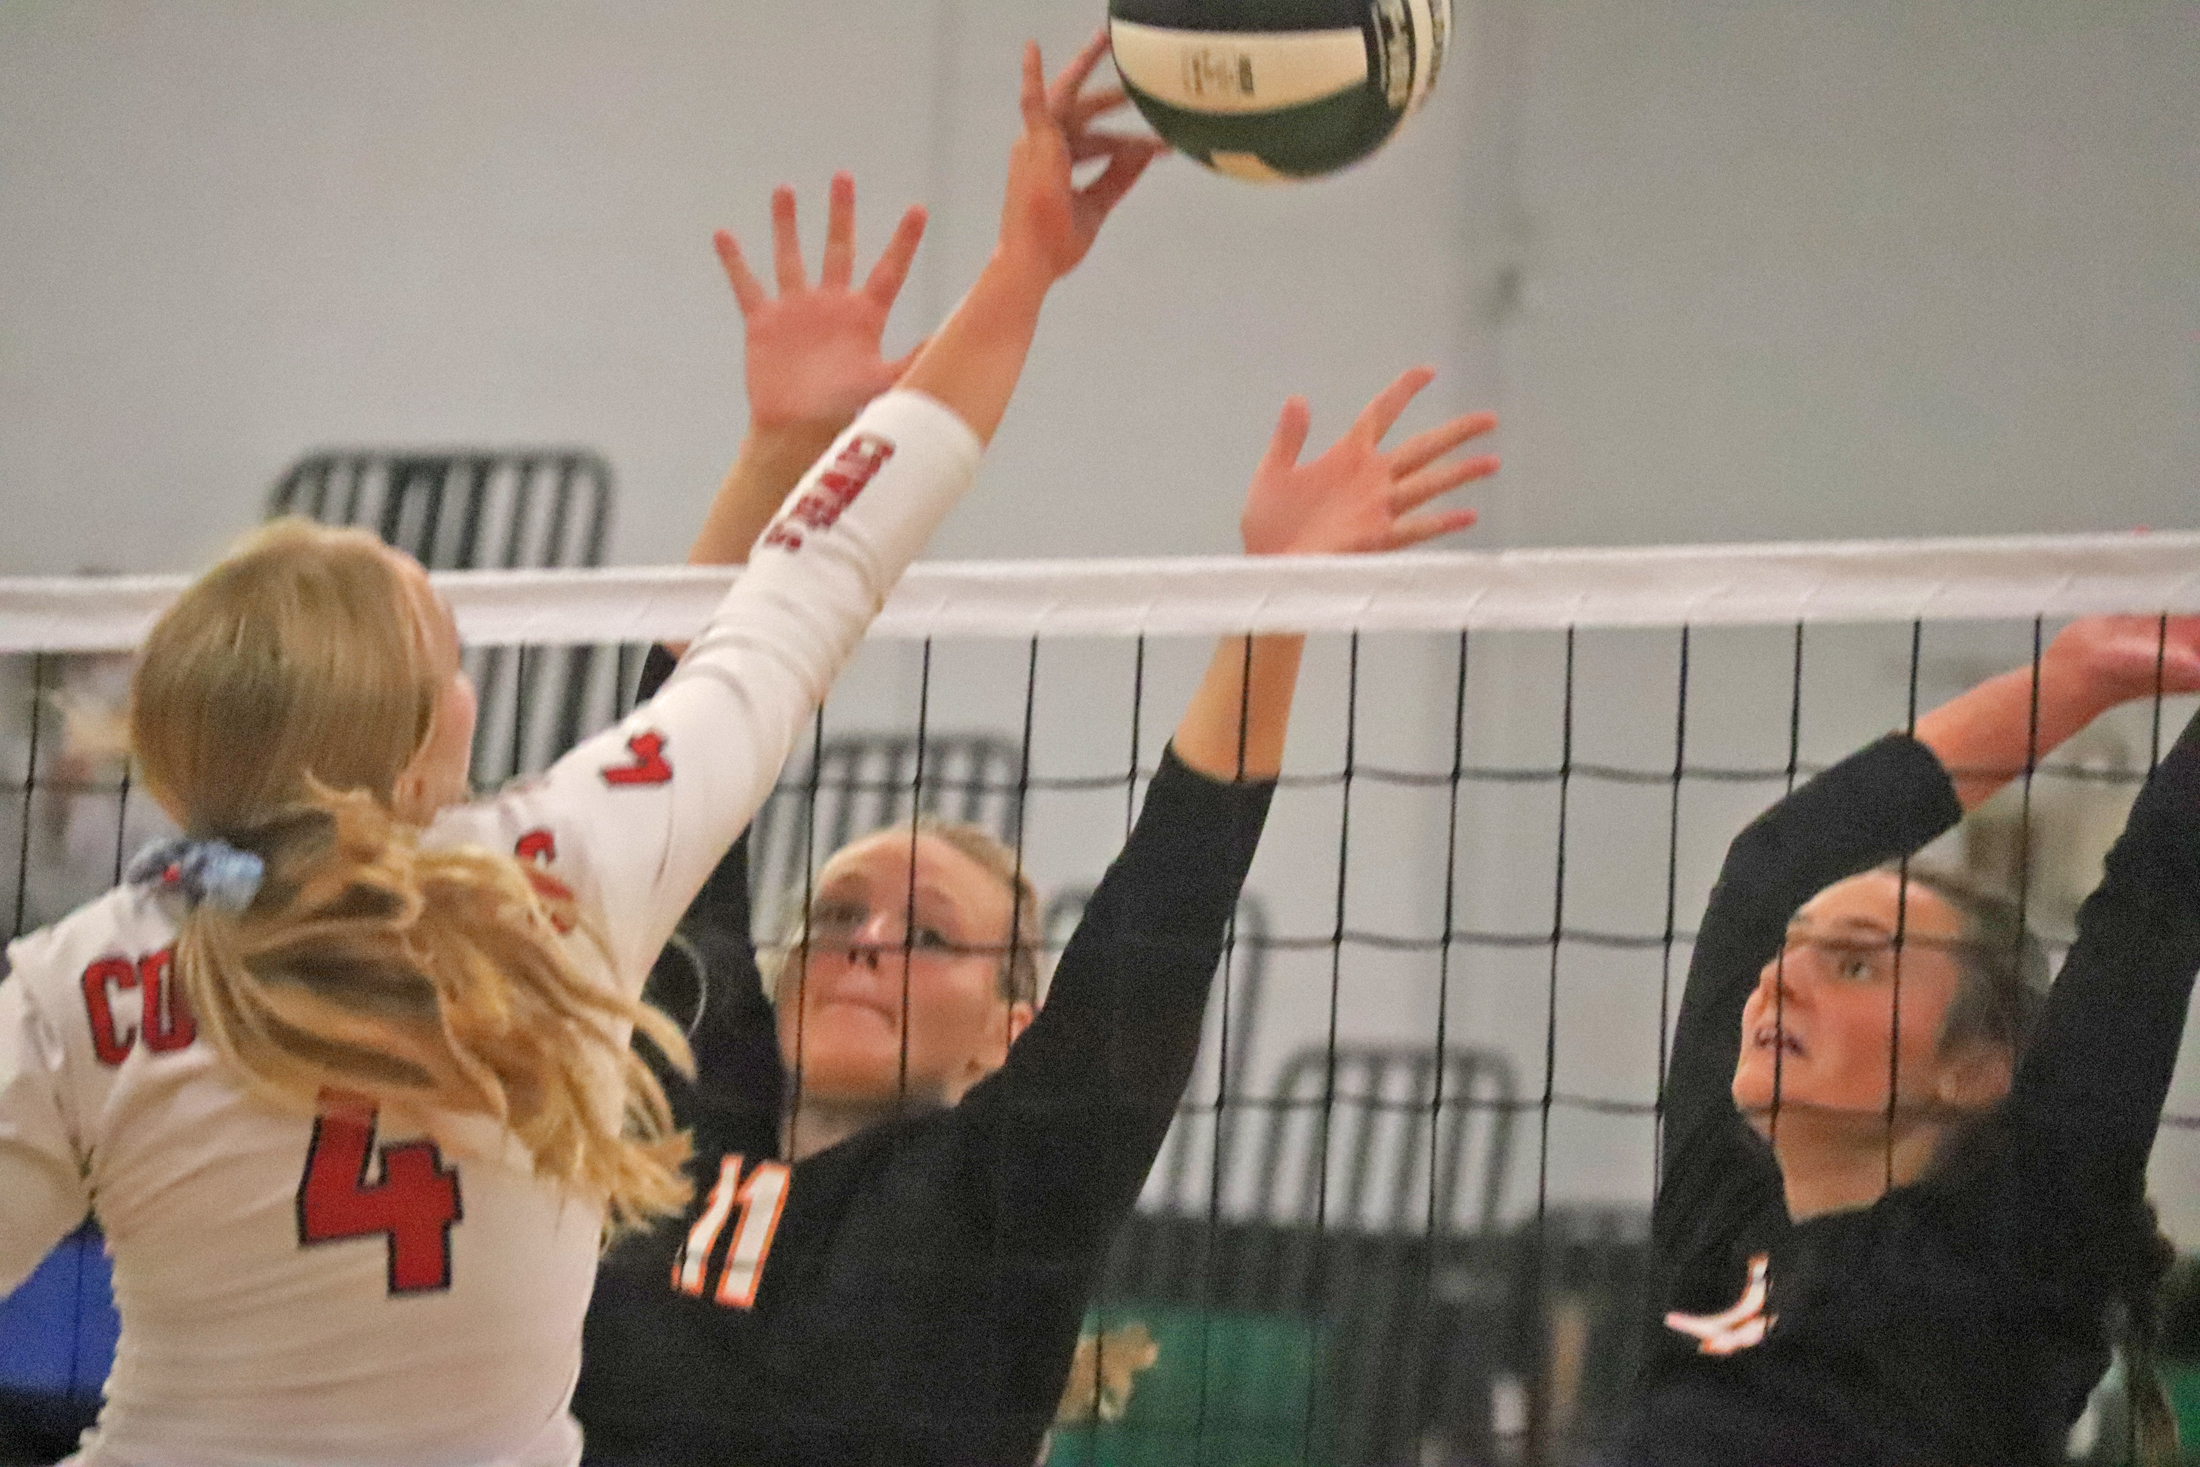 Comet go 1-3 at high-calibre volleyball tournament